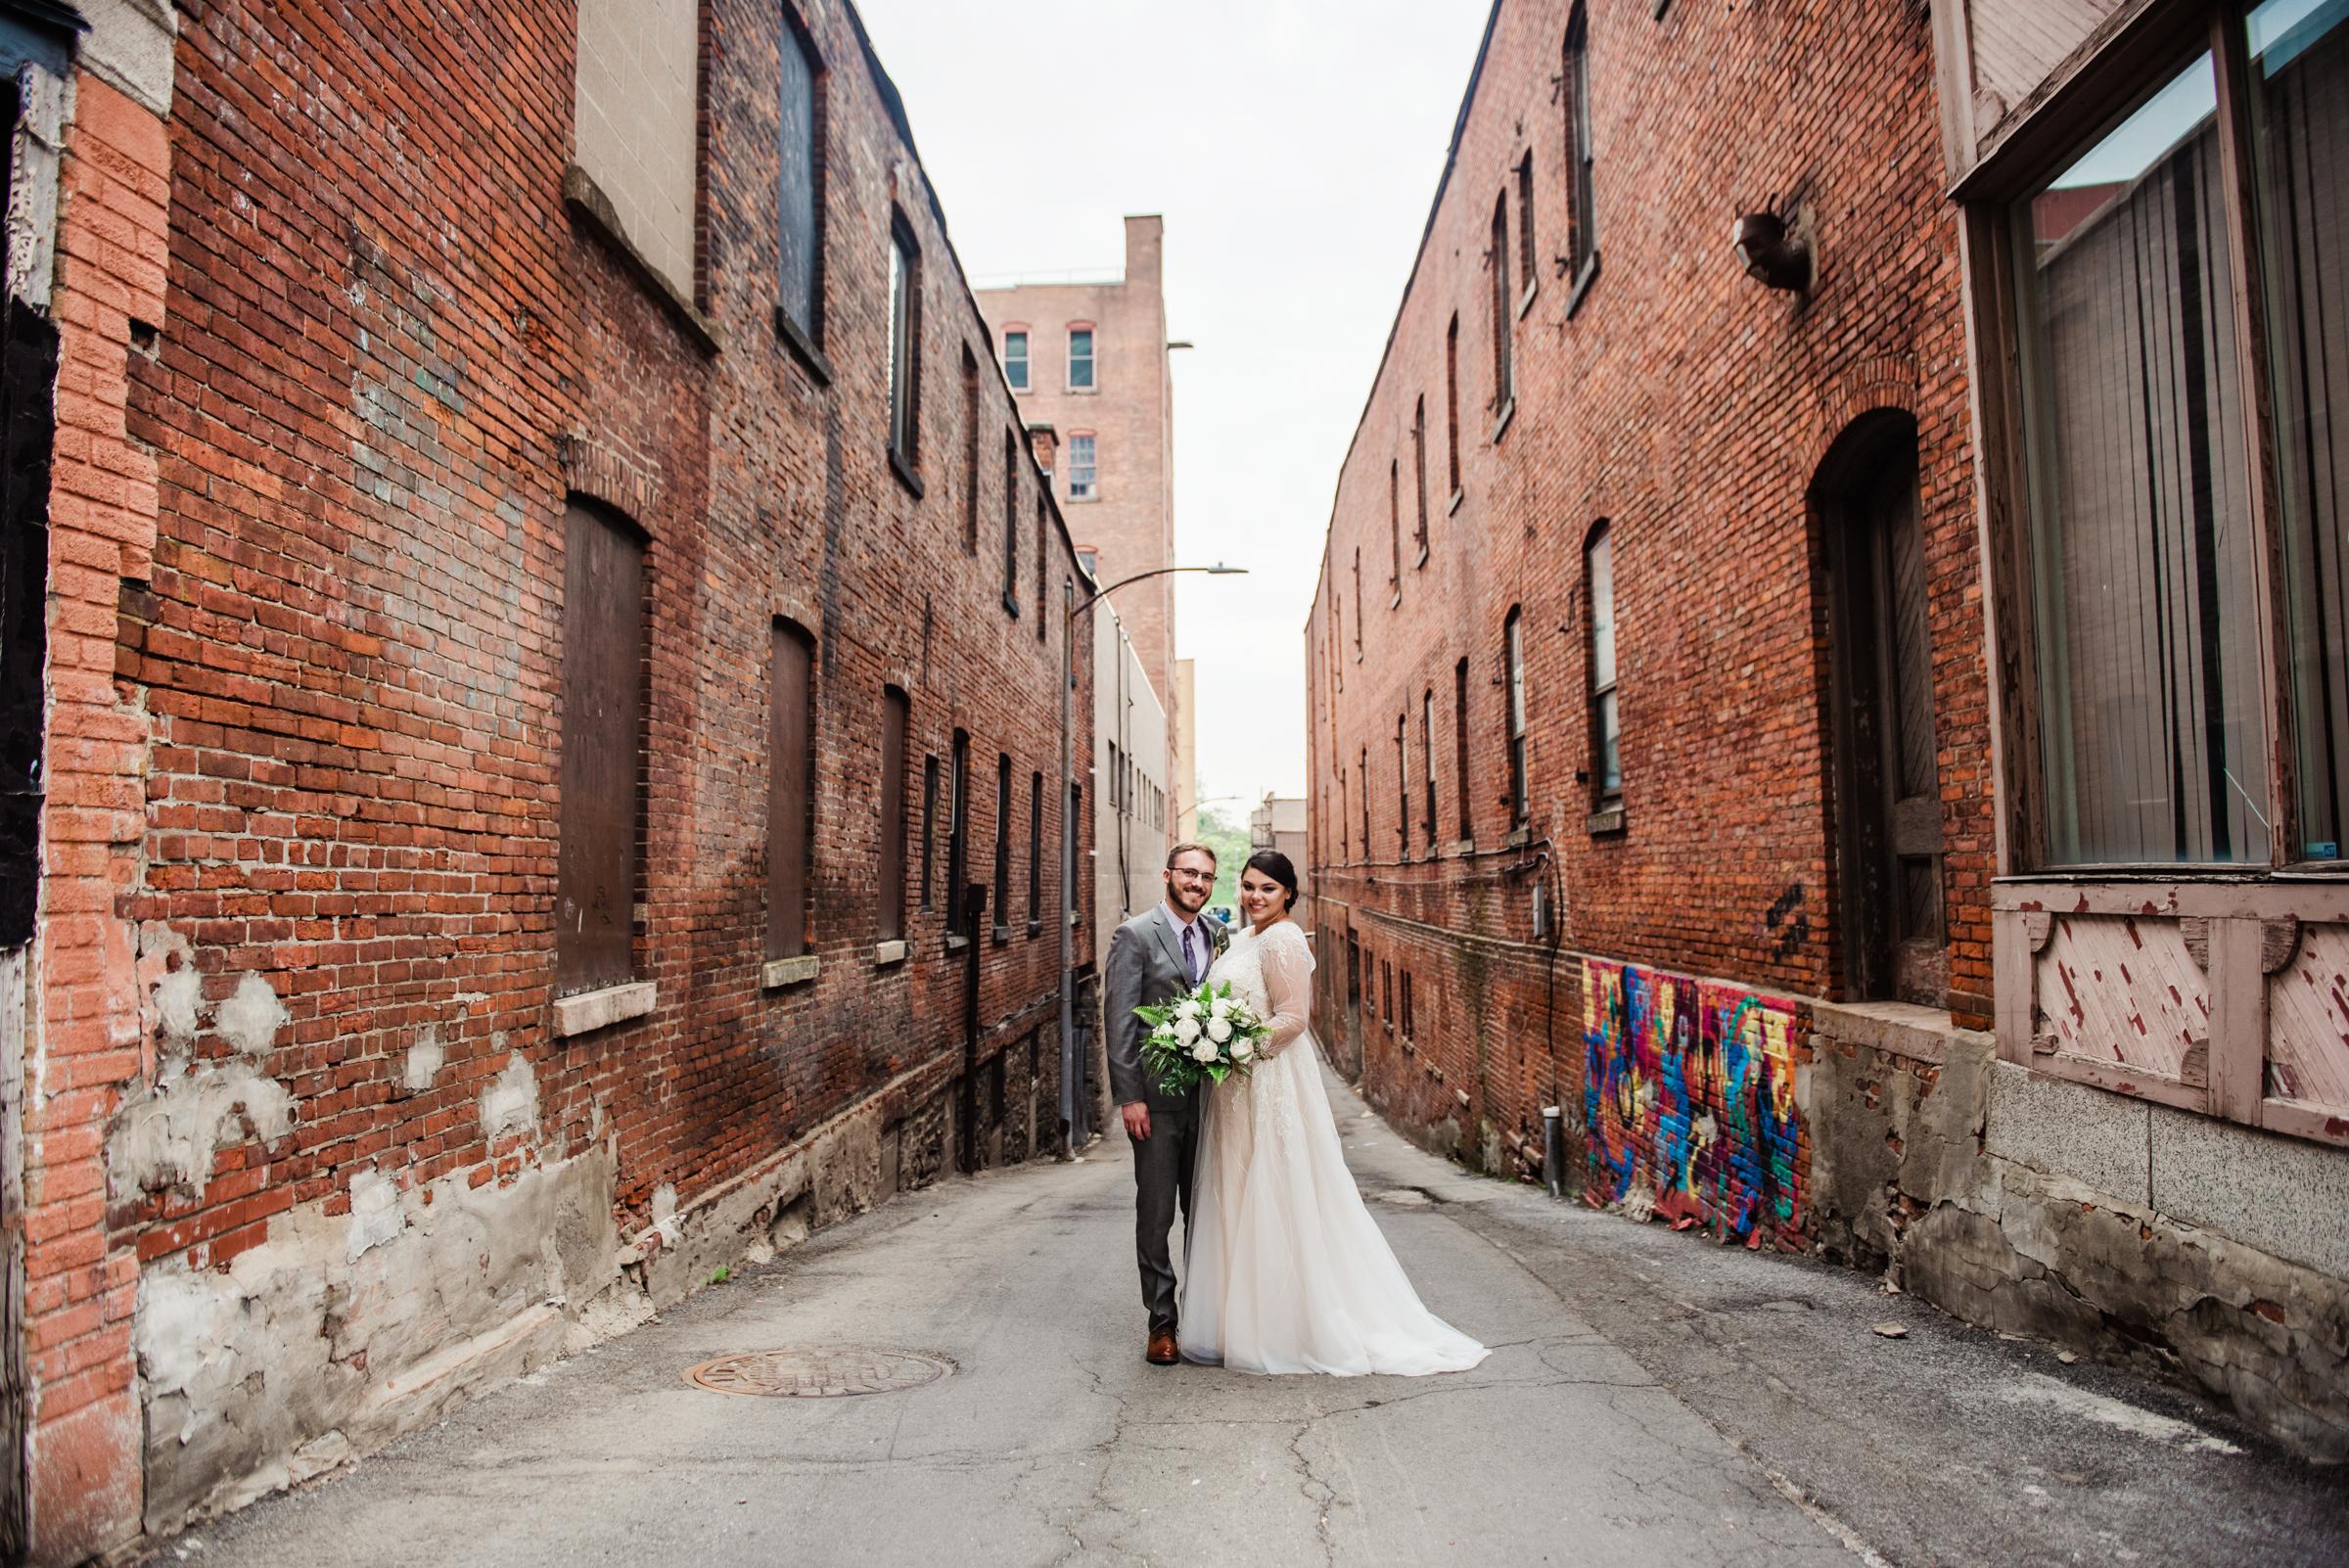 Studio_180_Lamberton_Conservatory_Rochester_Wedding_JILL_STUDIO_Rochester_NY_Photographer_DSC_9026.jpg